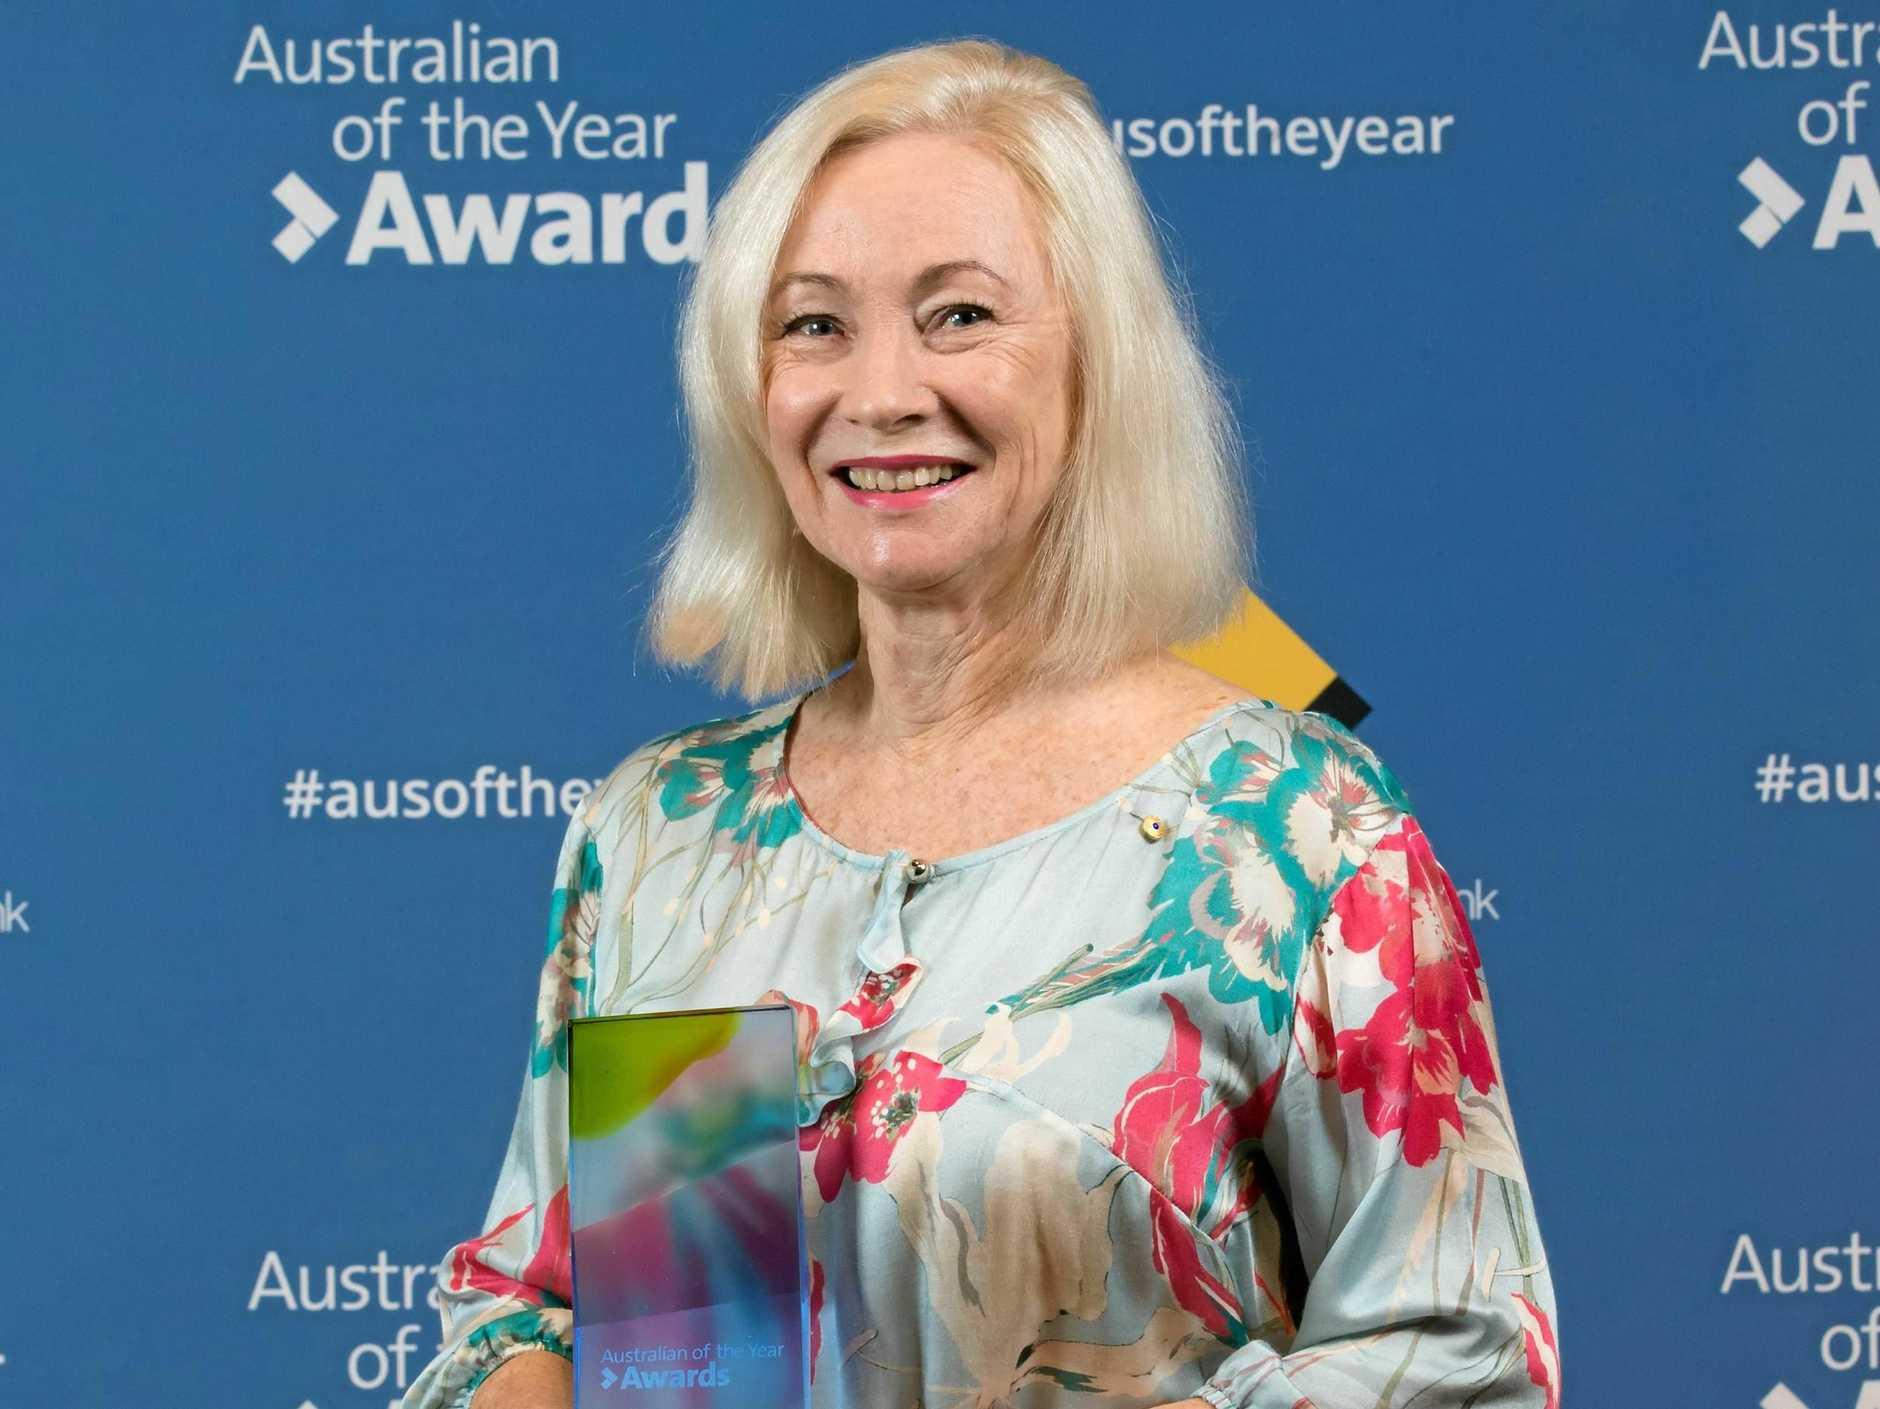 NOMINEE: Senior Australian of the Year 2018, Queensland nominee, Dr Diminity Dornan.